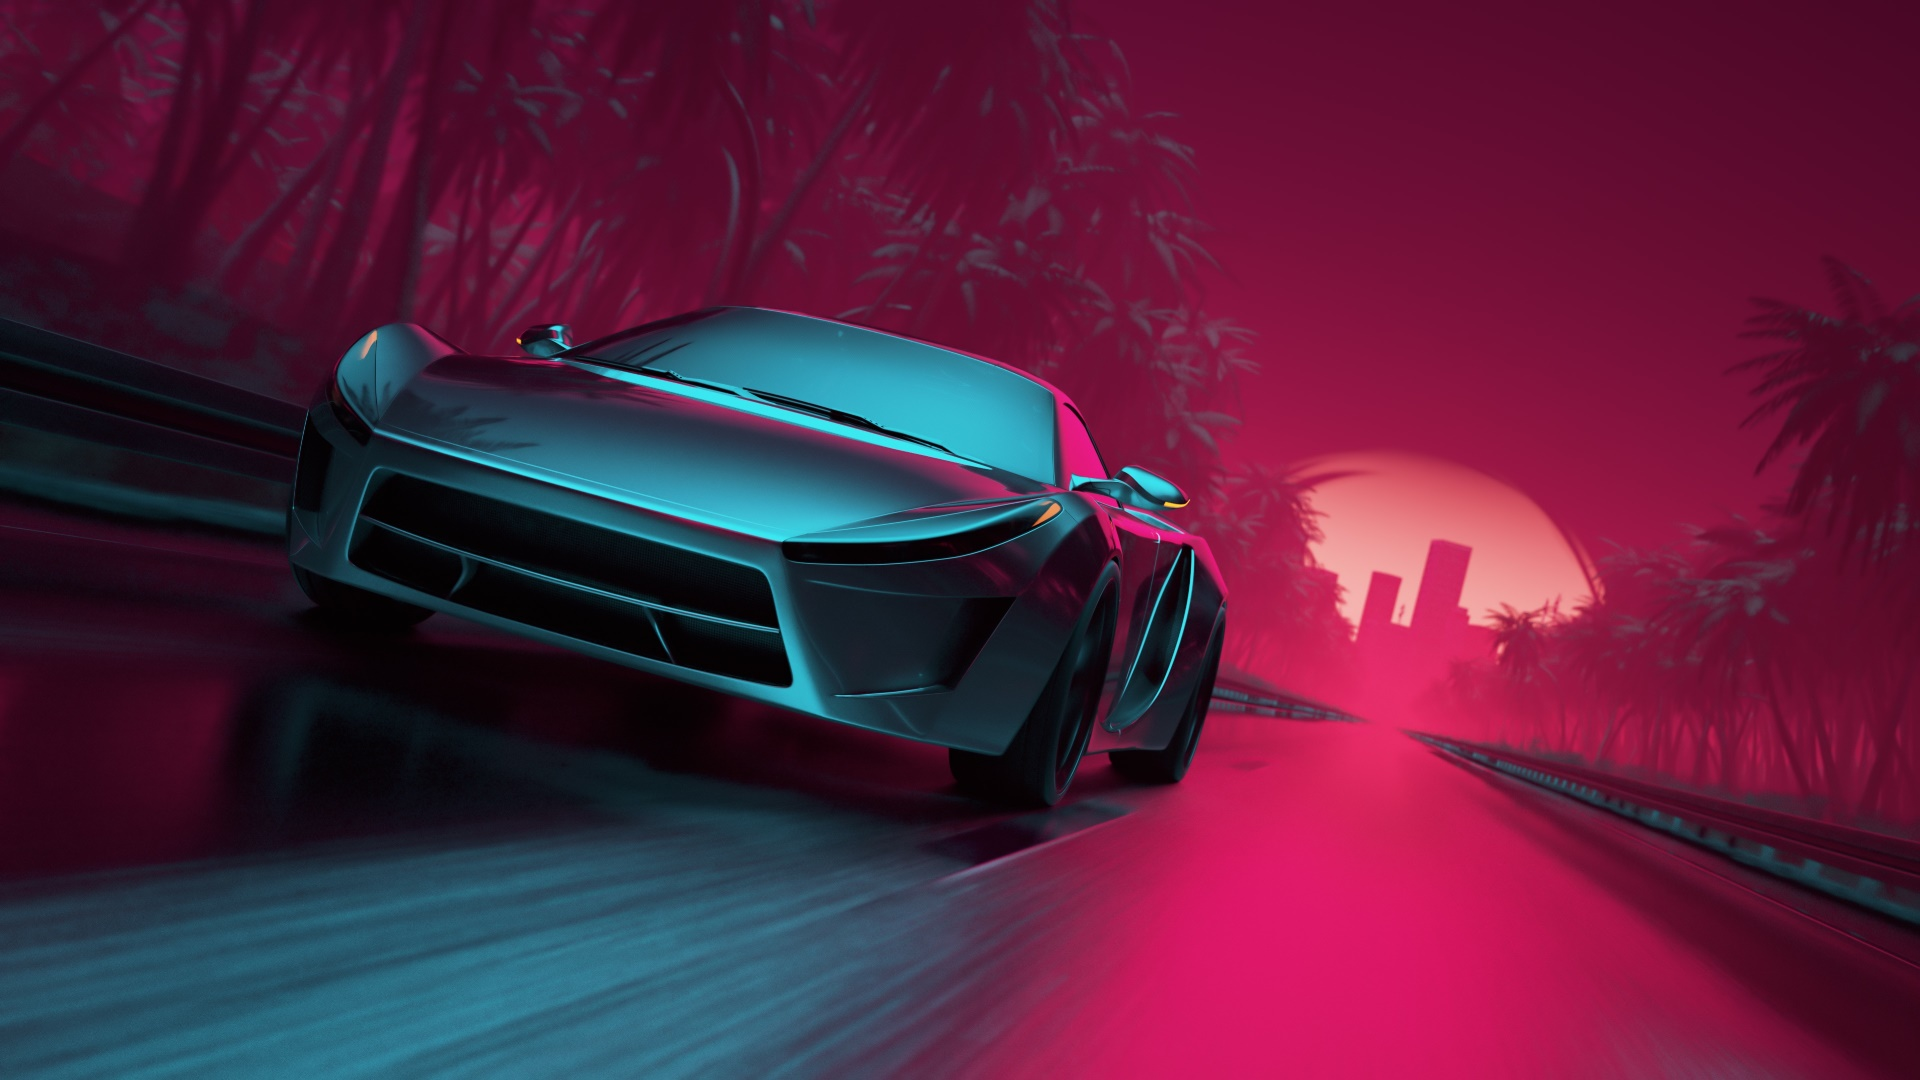 1366x768 Neon Synthwave Sport Car 1366x768 Resolution Hd 4k